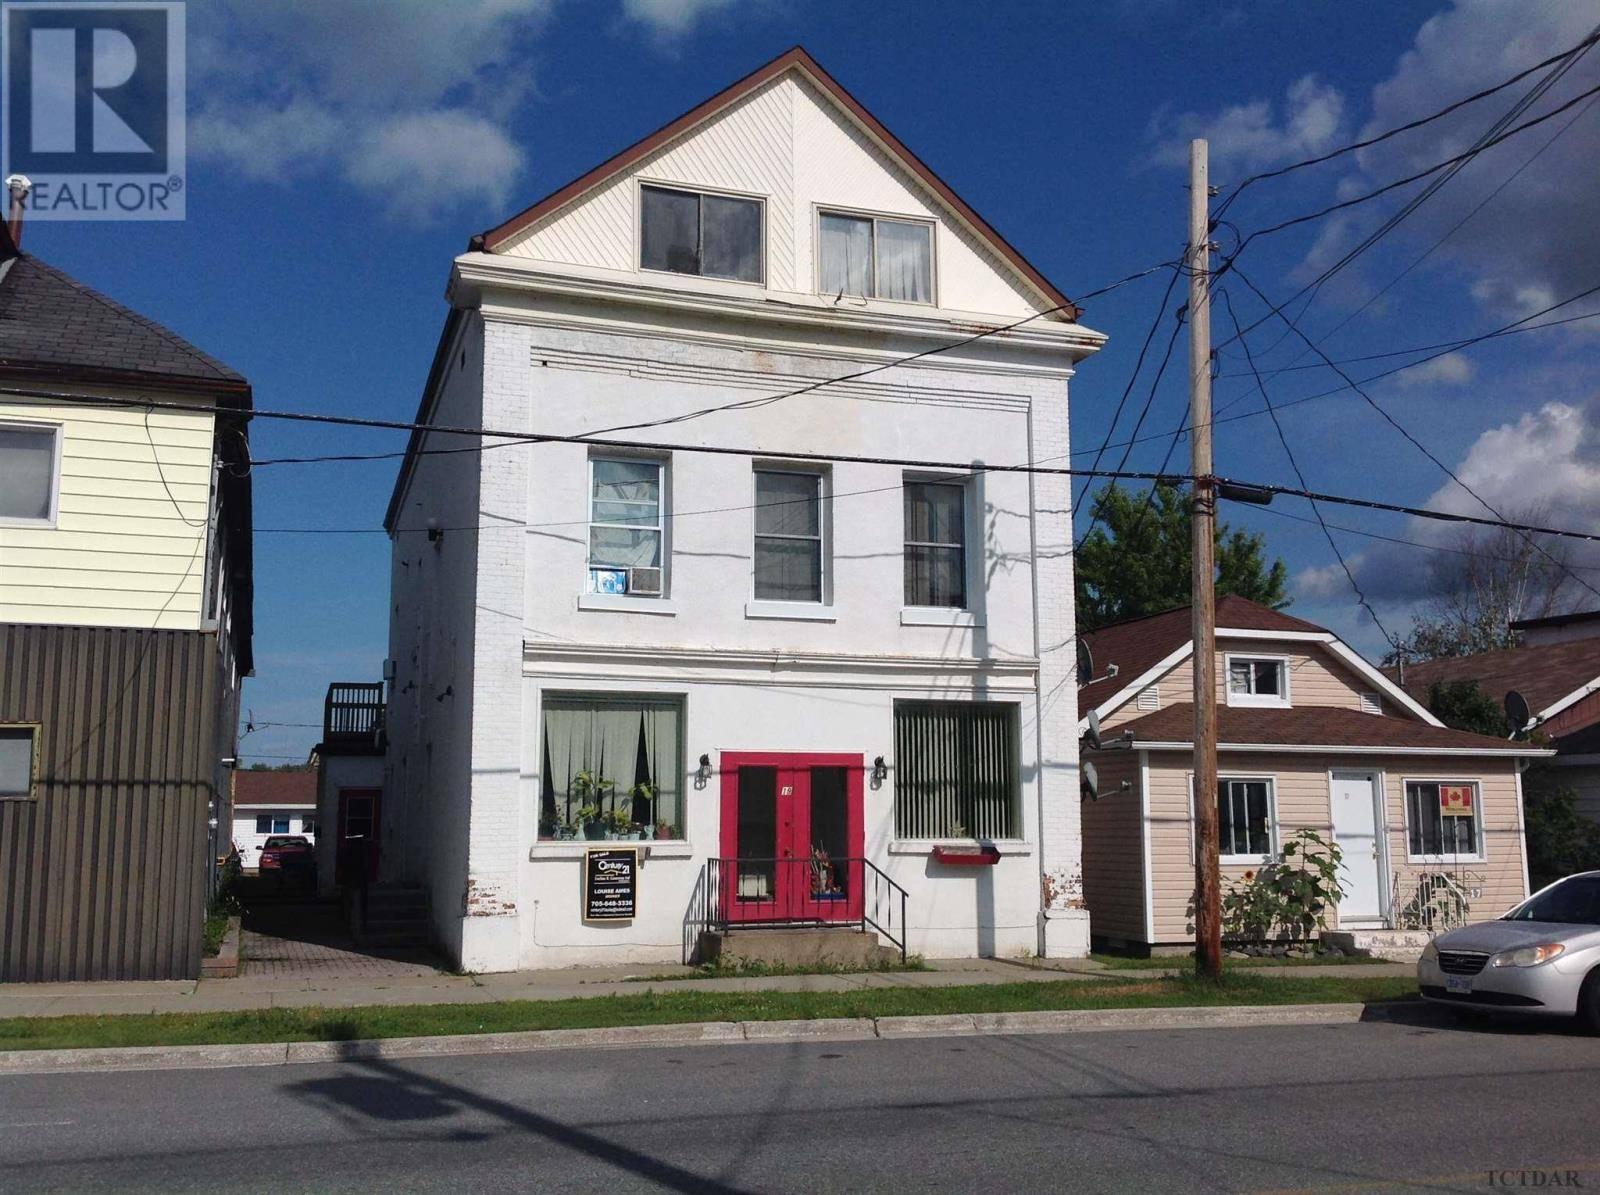 Townhouse for sale at 19 Cobalt St Cobalt Ontario - MLS: TM200052